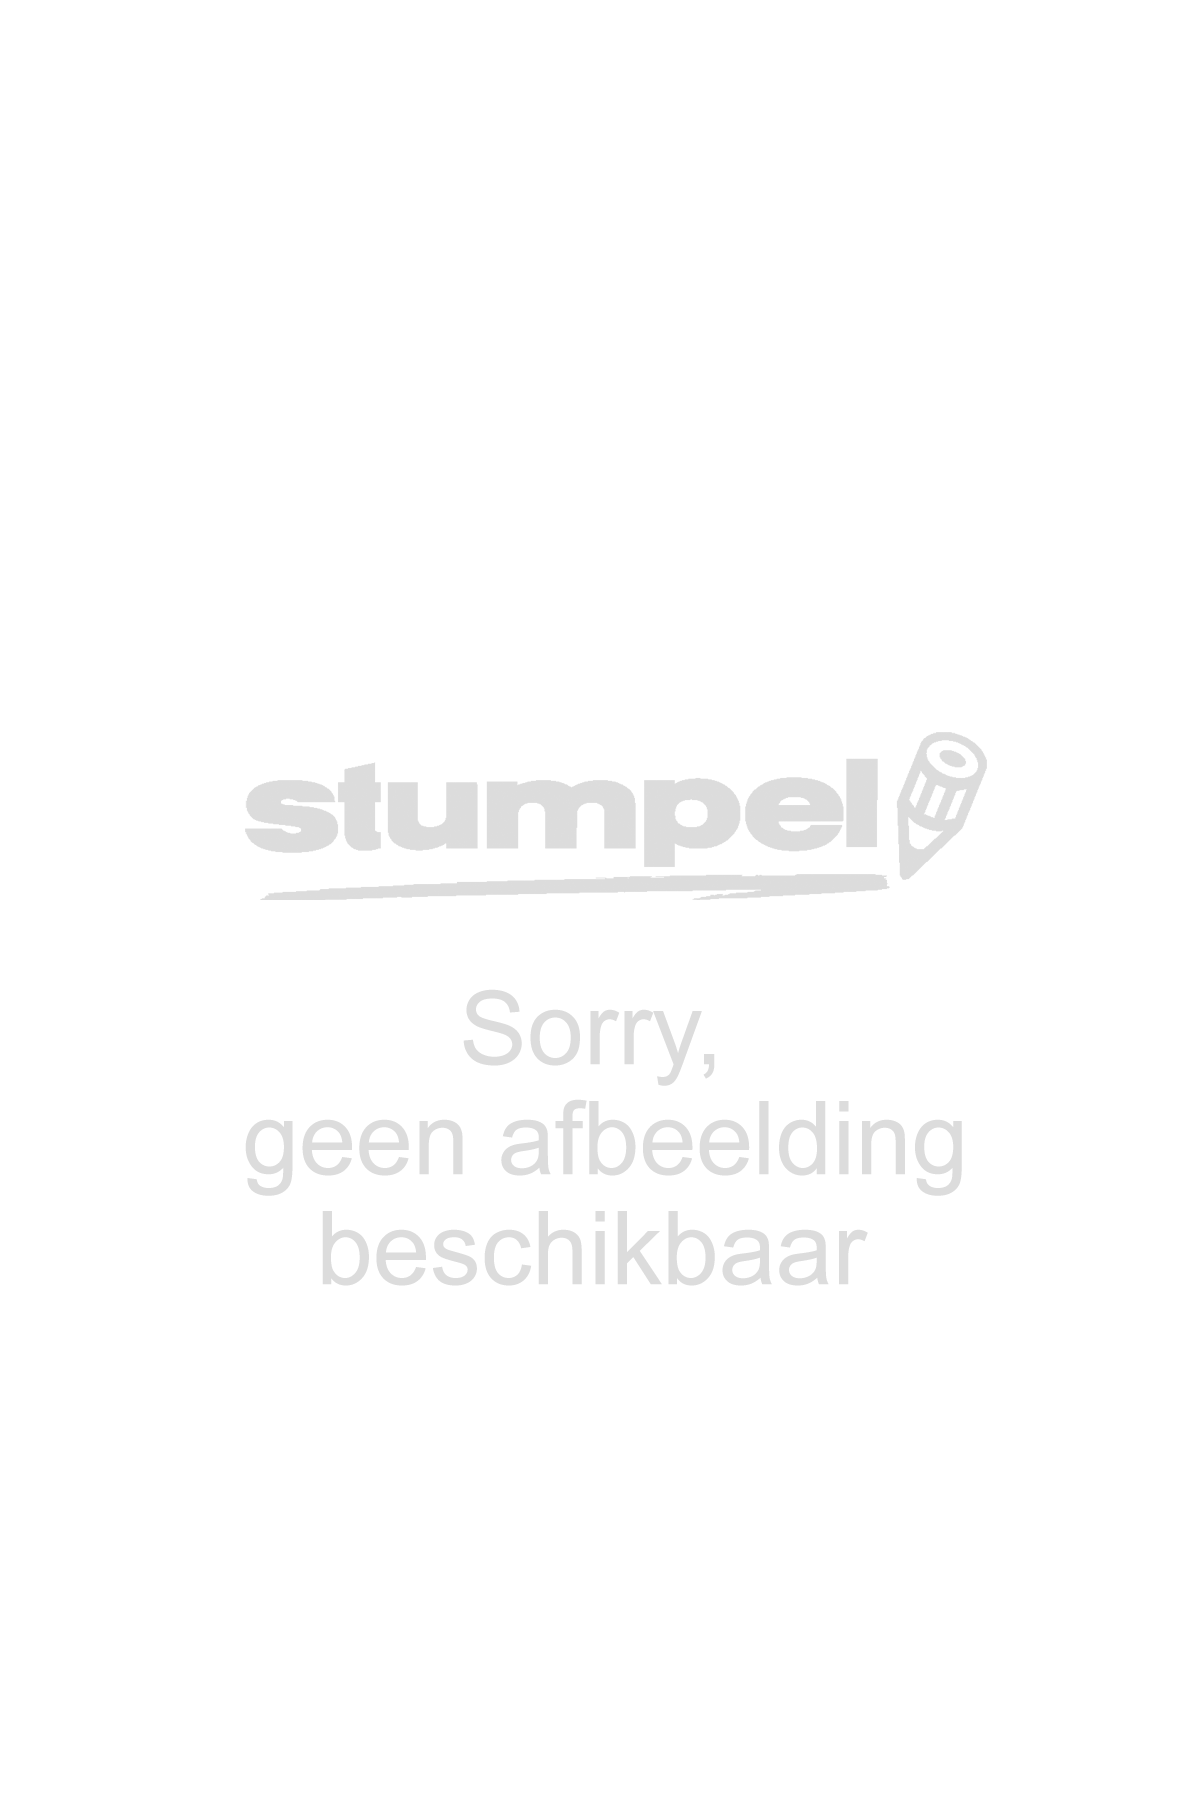 post-it-colibri-pak-a8-stationary-paperclip-10804095